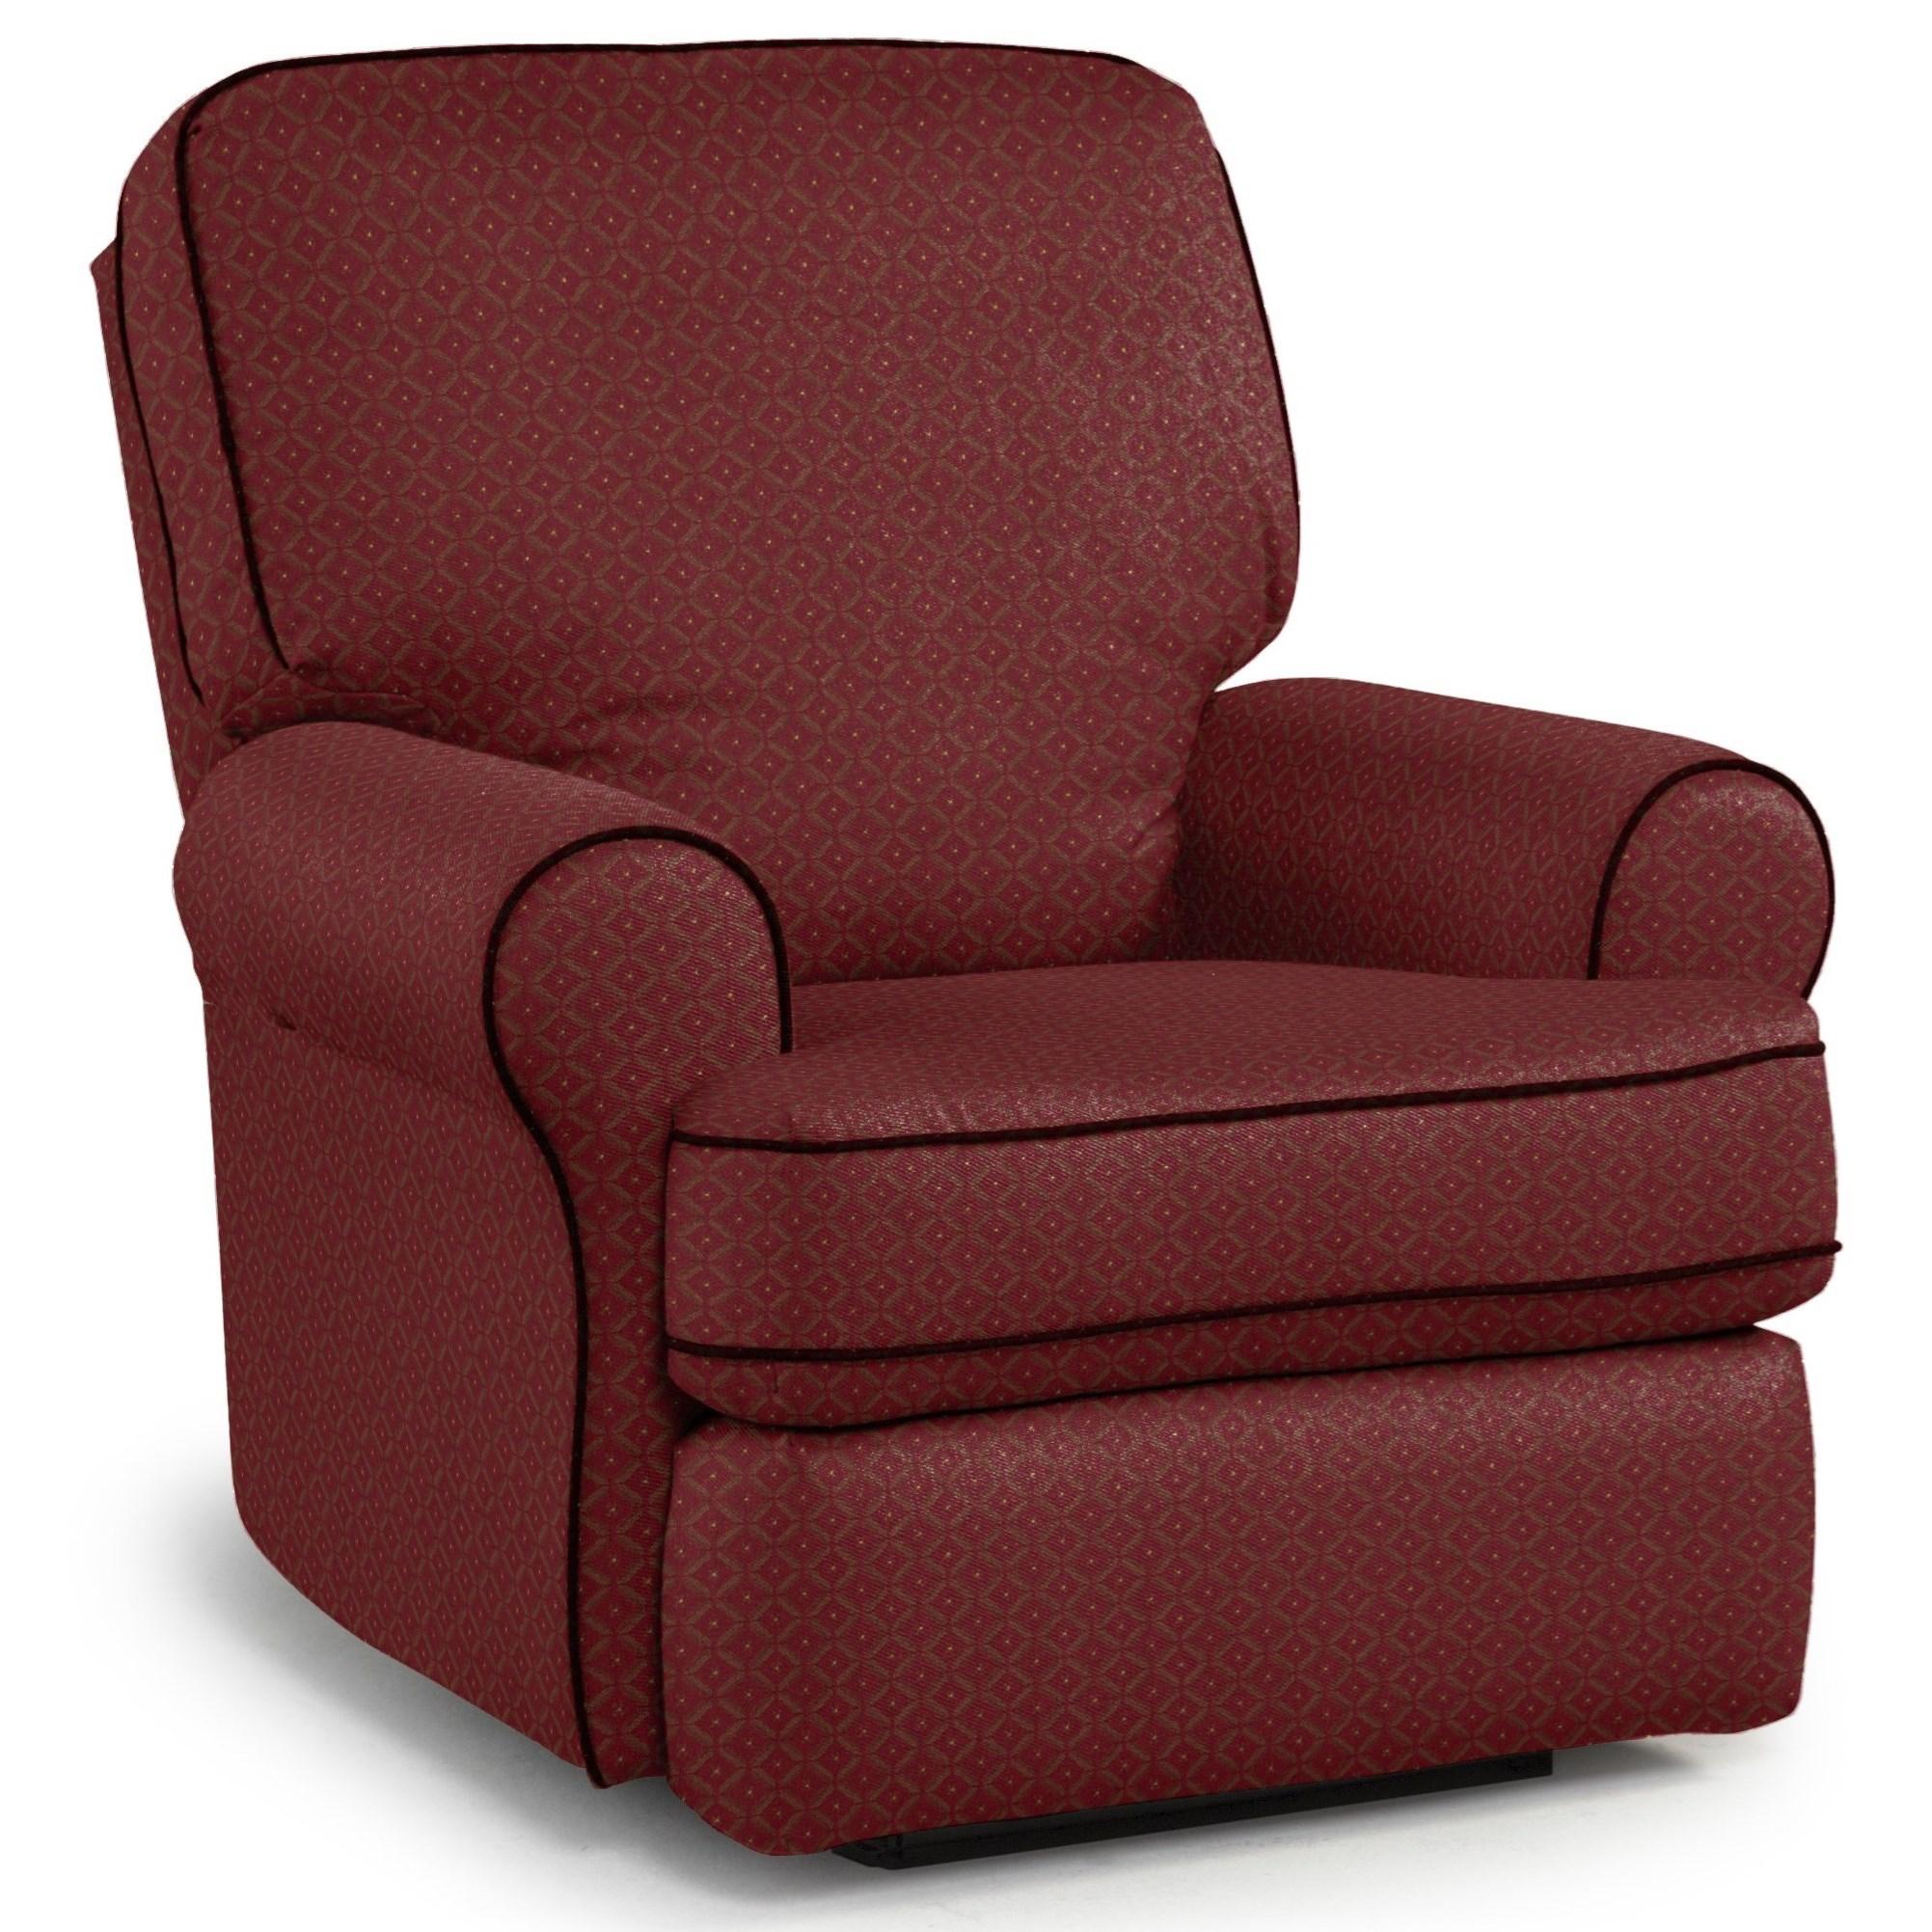 Best Home Furnishings Tryp Wallhugger Recliner - Item Number: -1743602149-18028